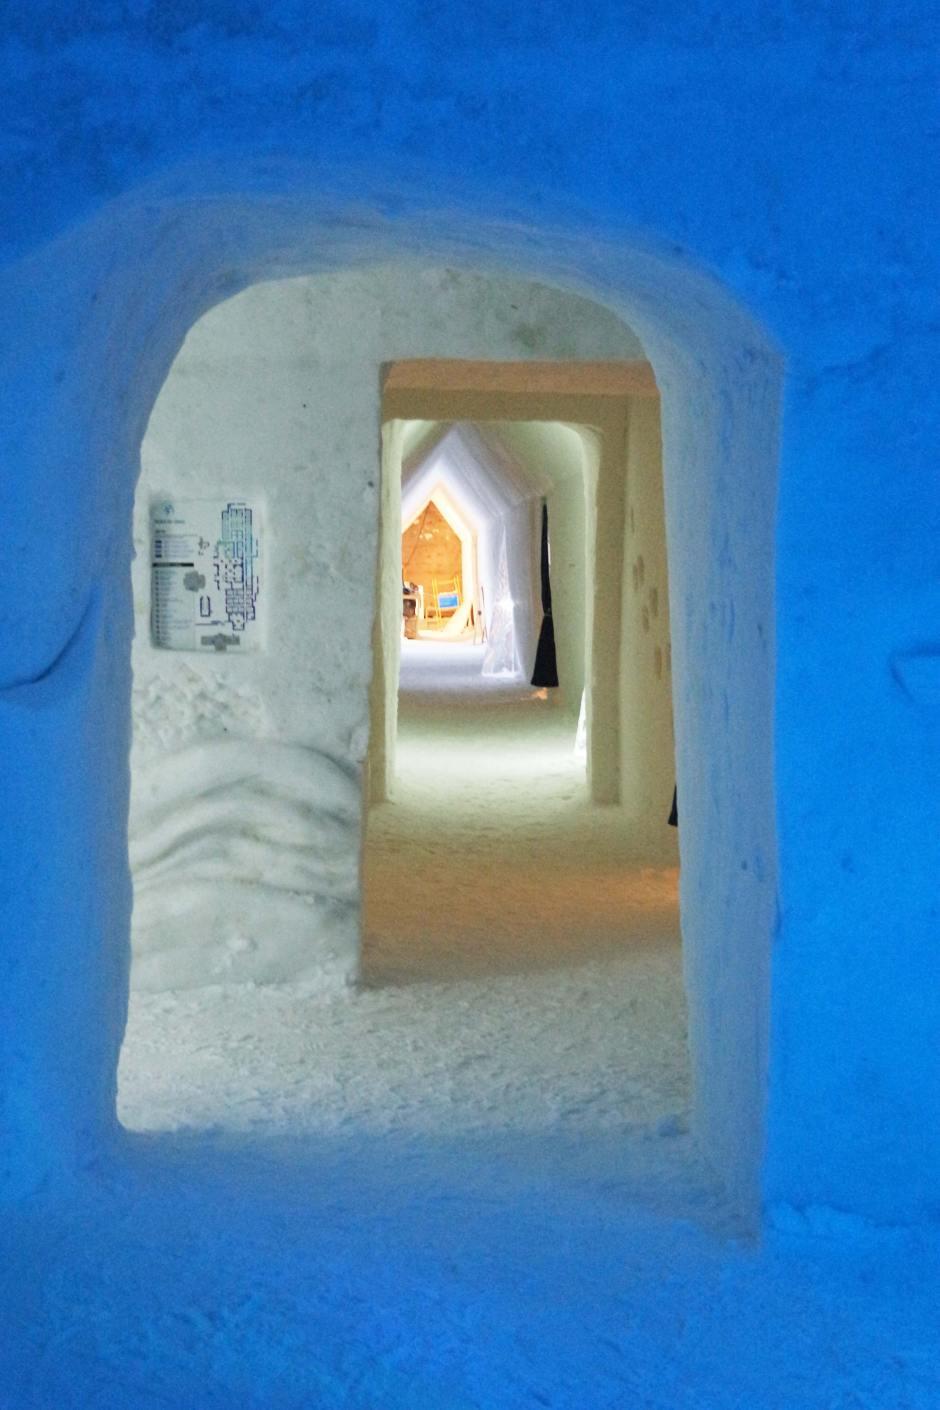 hôtel de glace québec hebergement insolite canada (22)